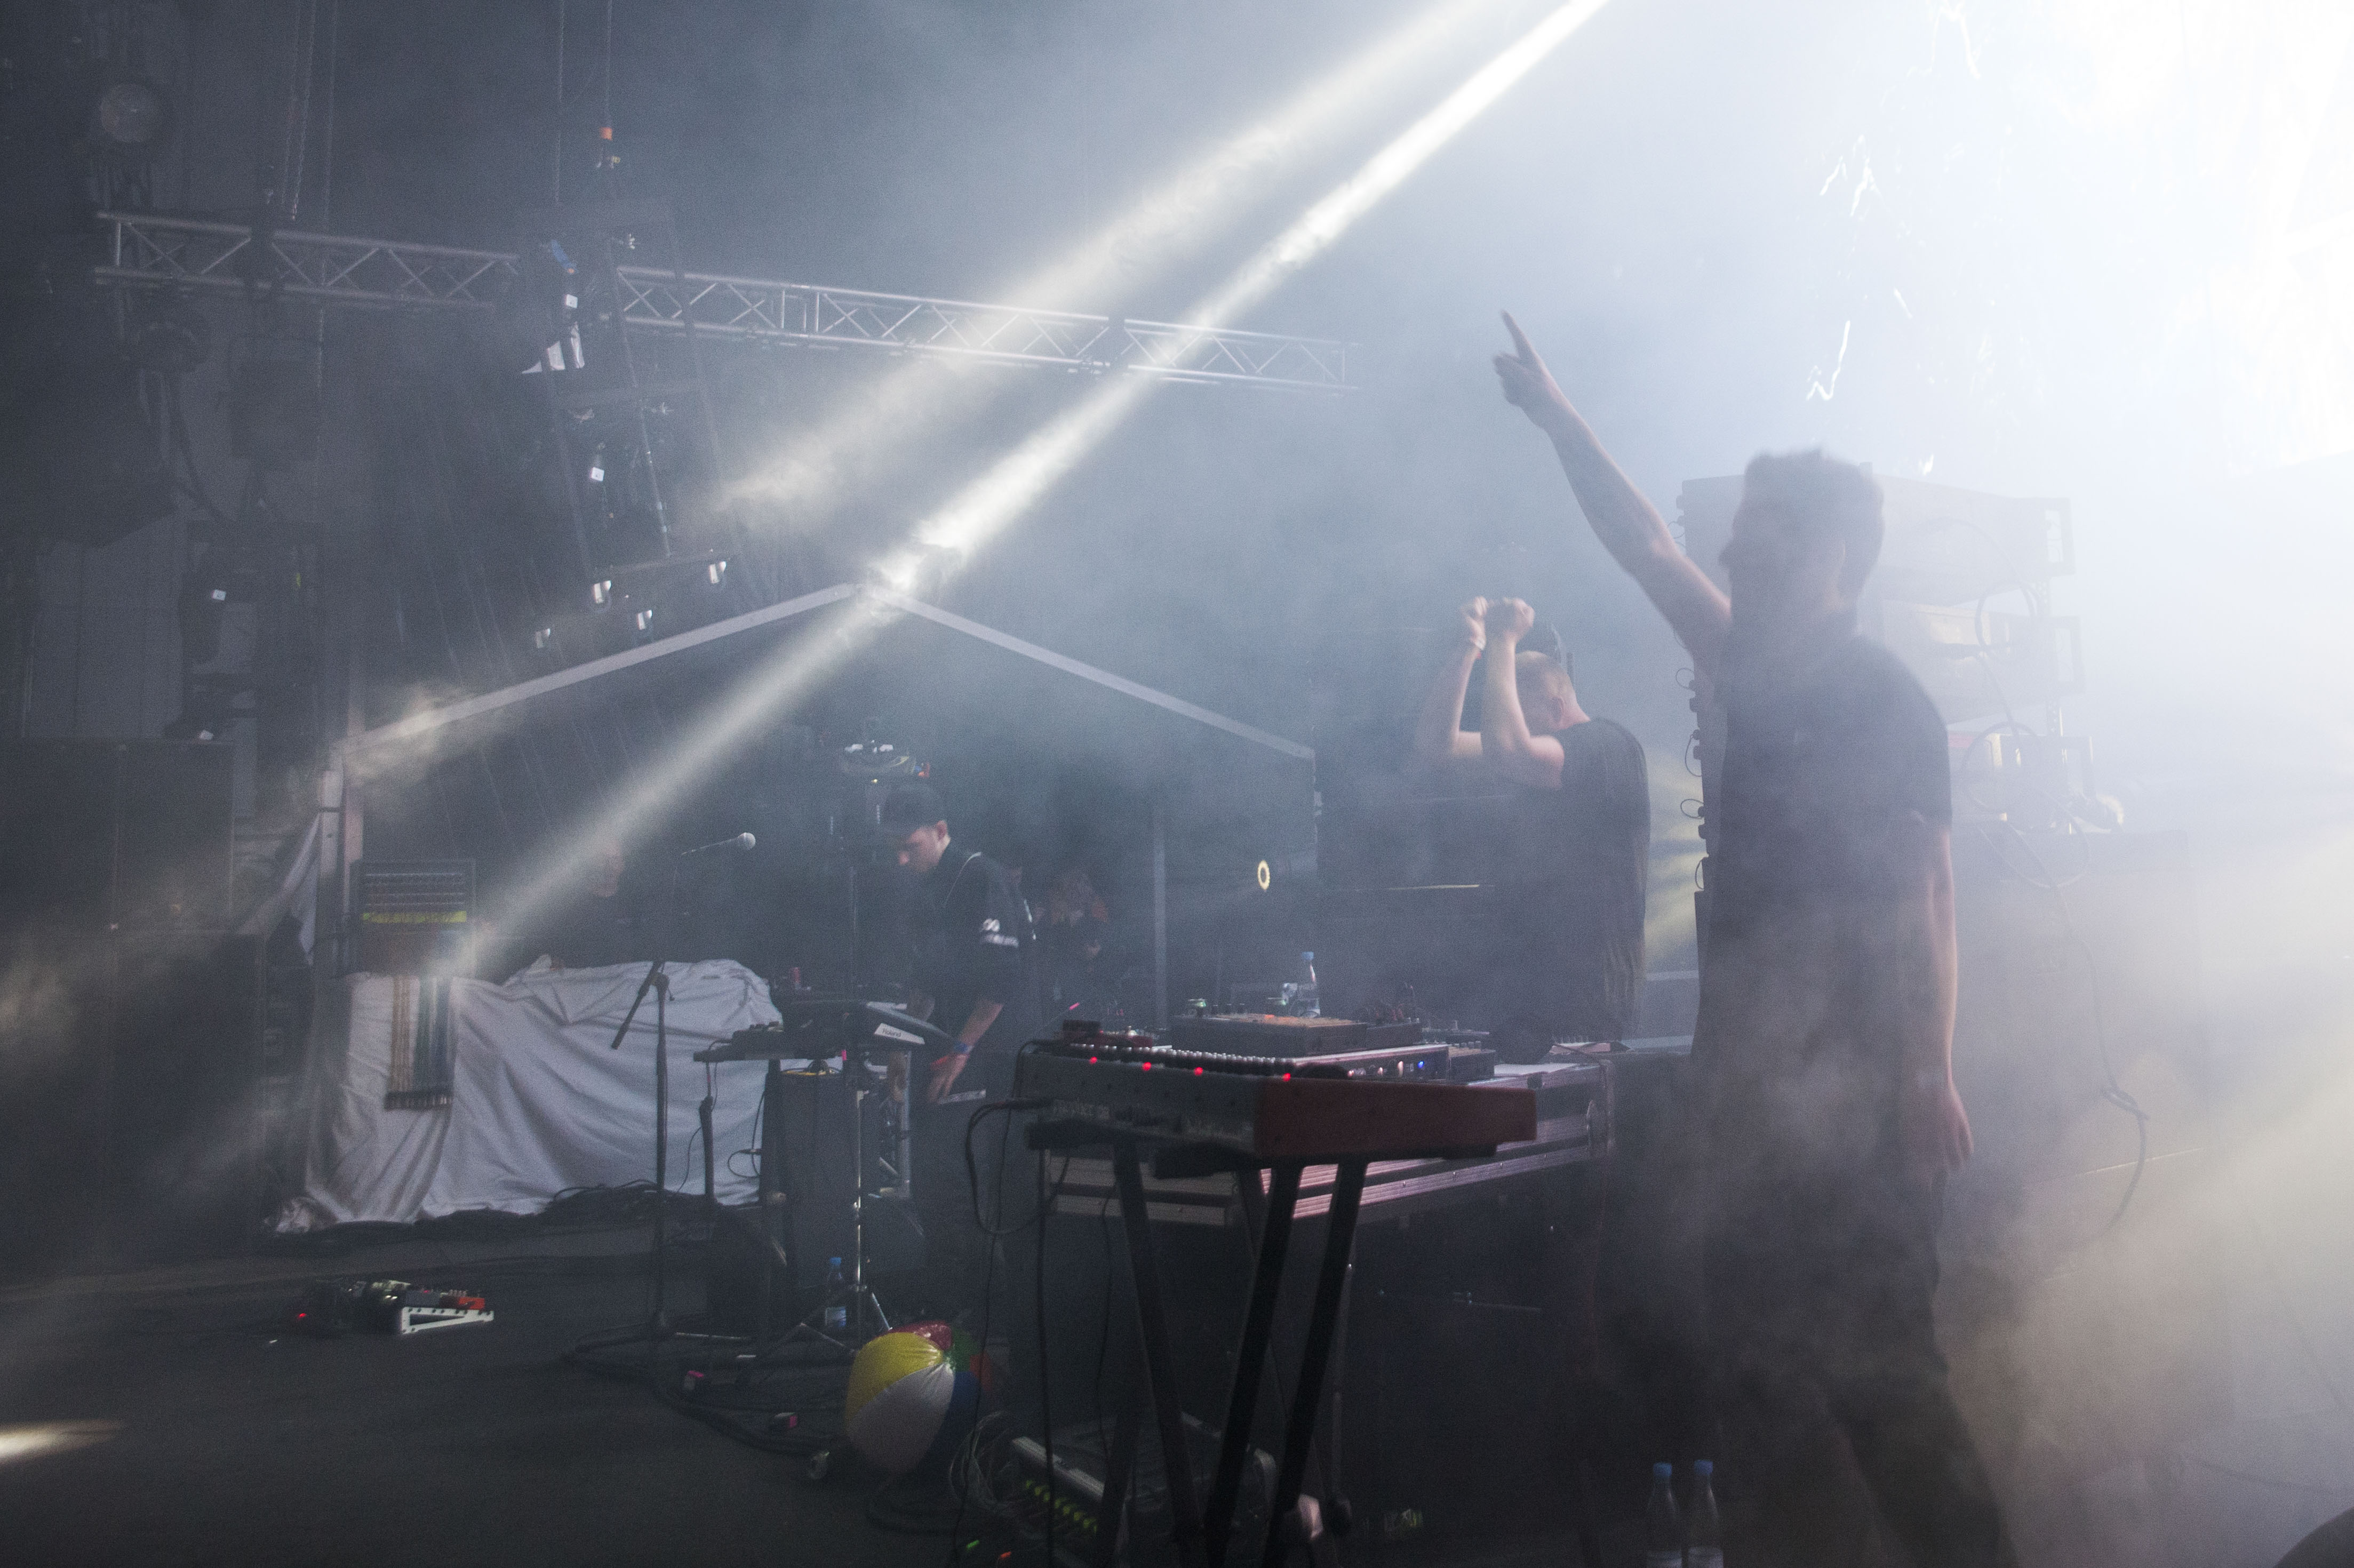 AVAVAV_GAFFADK_RoskildeFestival15_HelenaLundquist_5